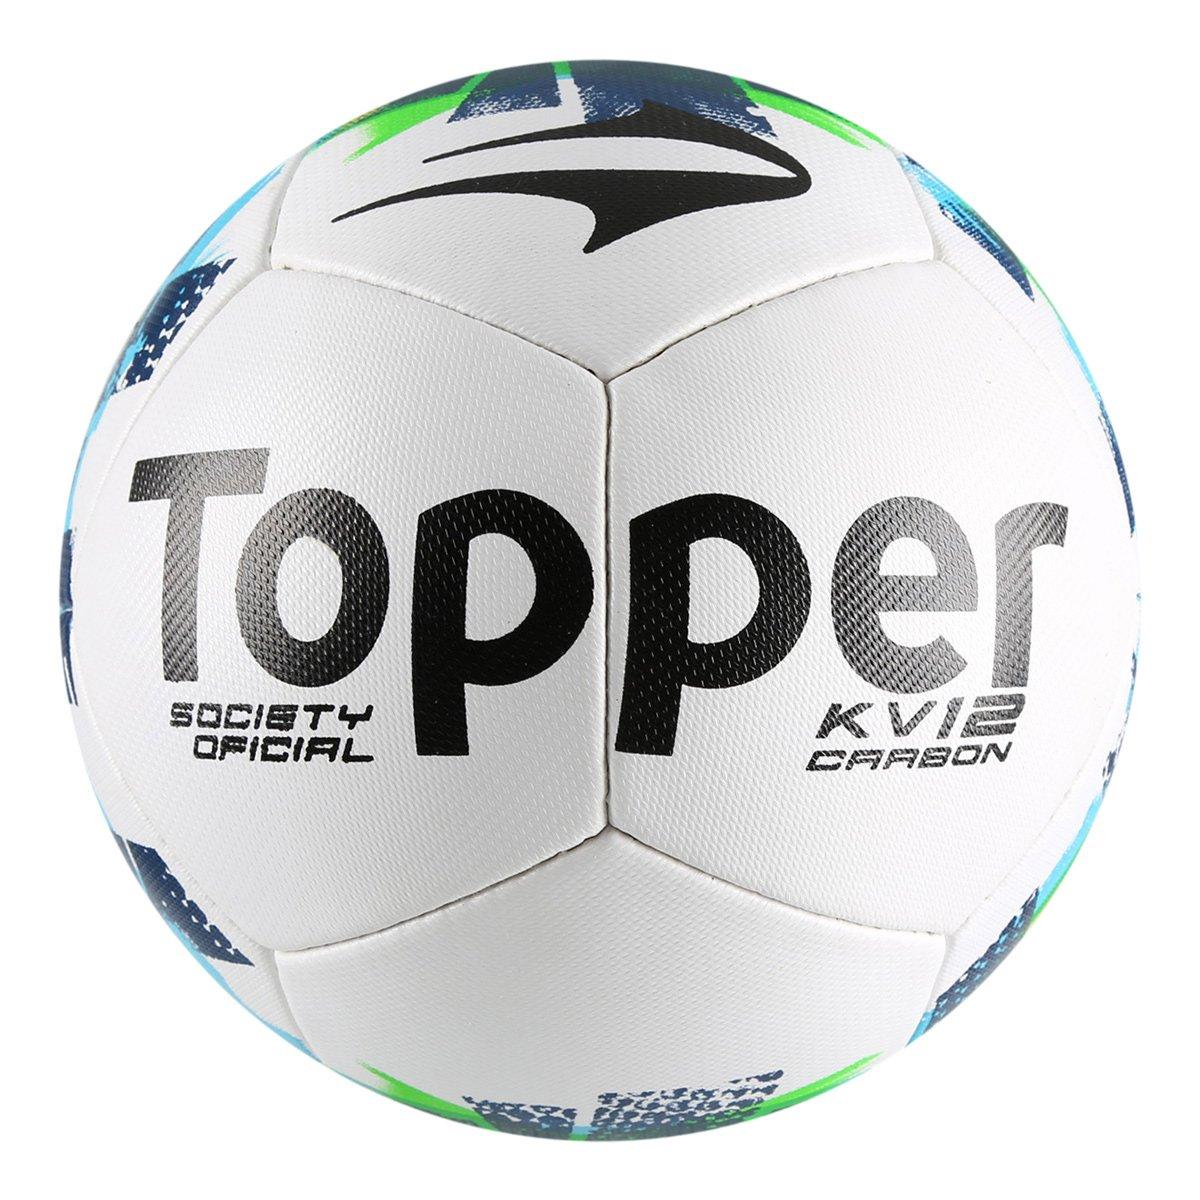 Bola Futebol Society Topper KV Carbon II - Compre Agora  c7819c8072903